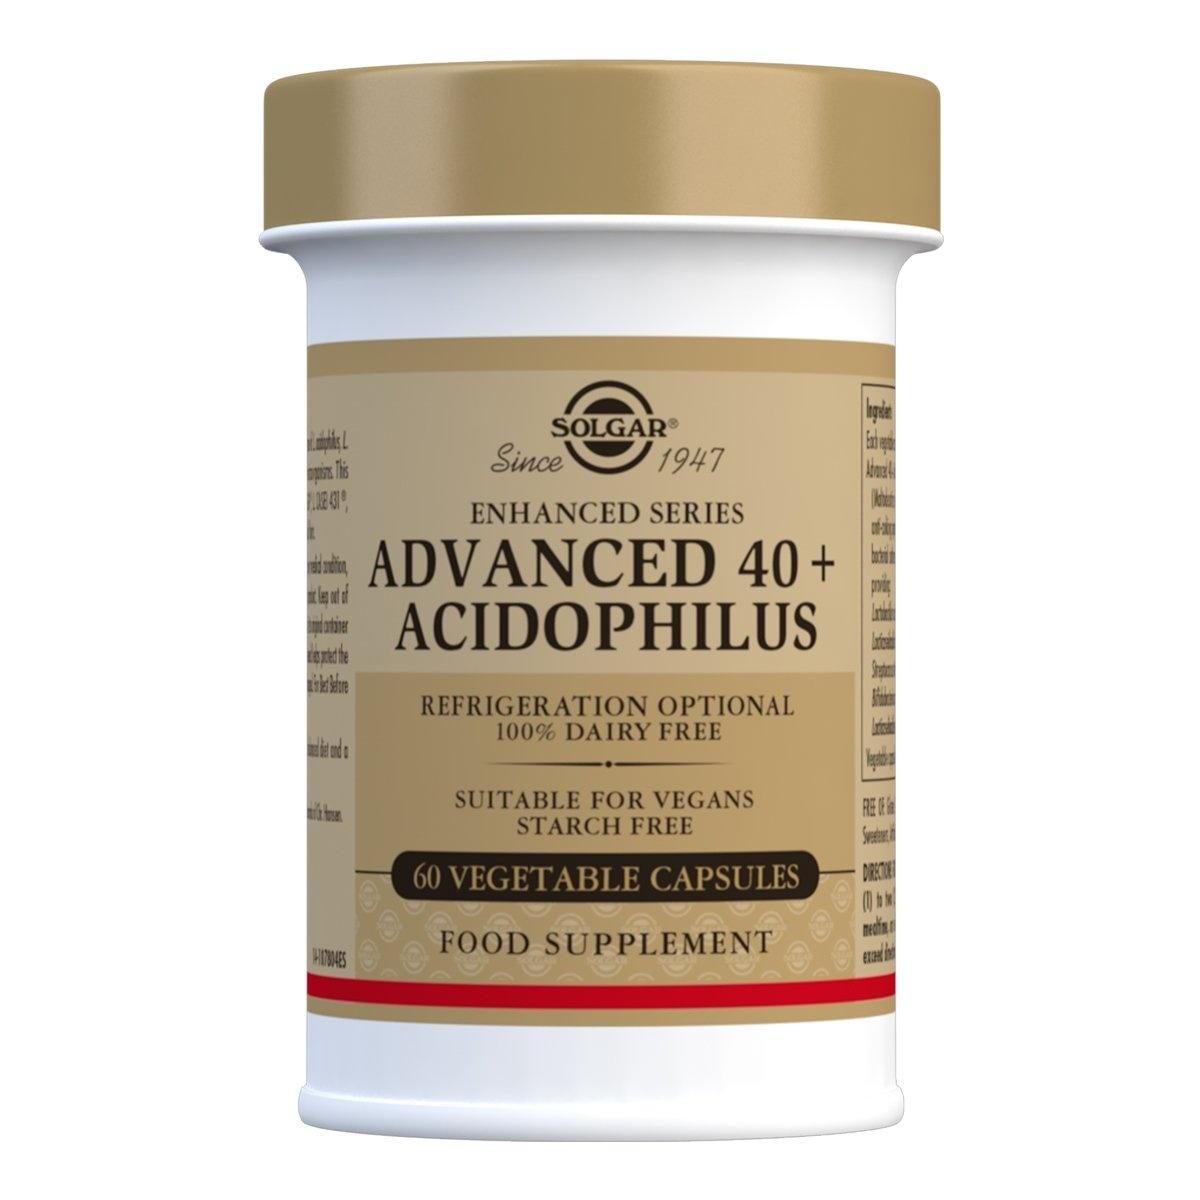 Solgar Advanced 40+ Acidophilus Vegetable Capsules - Pack of 60